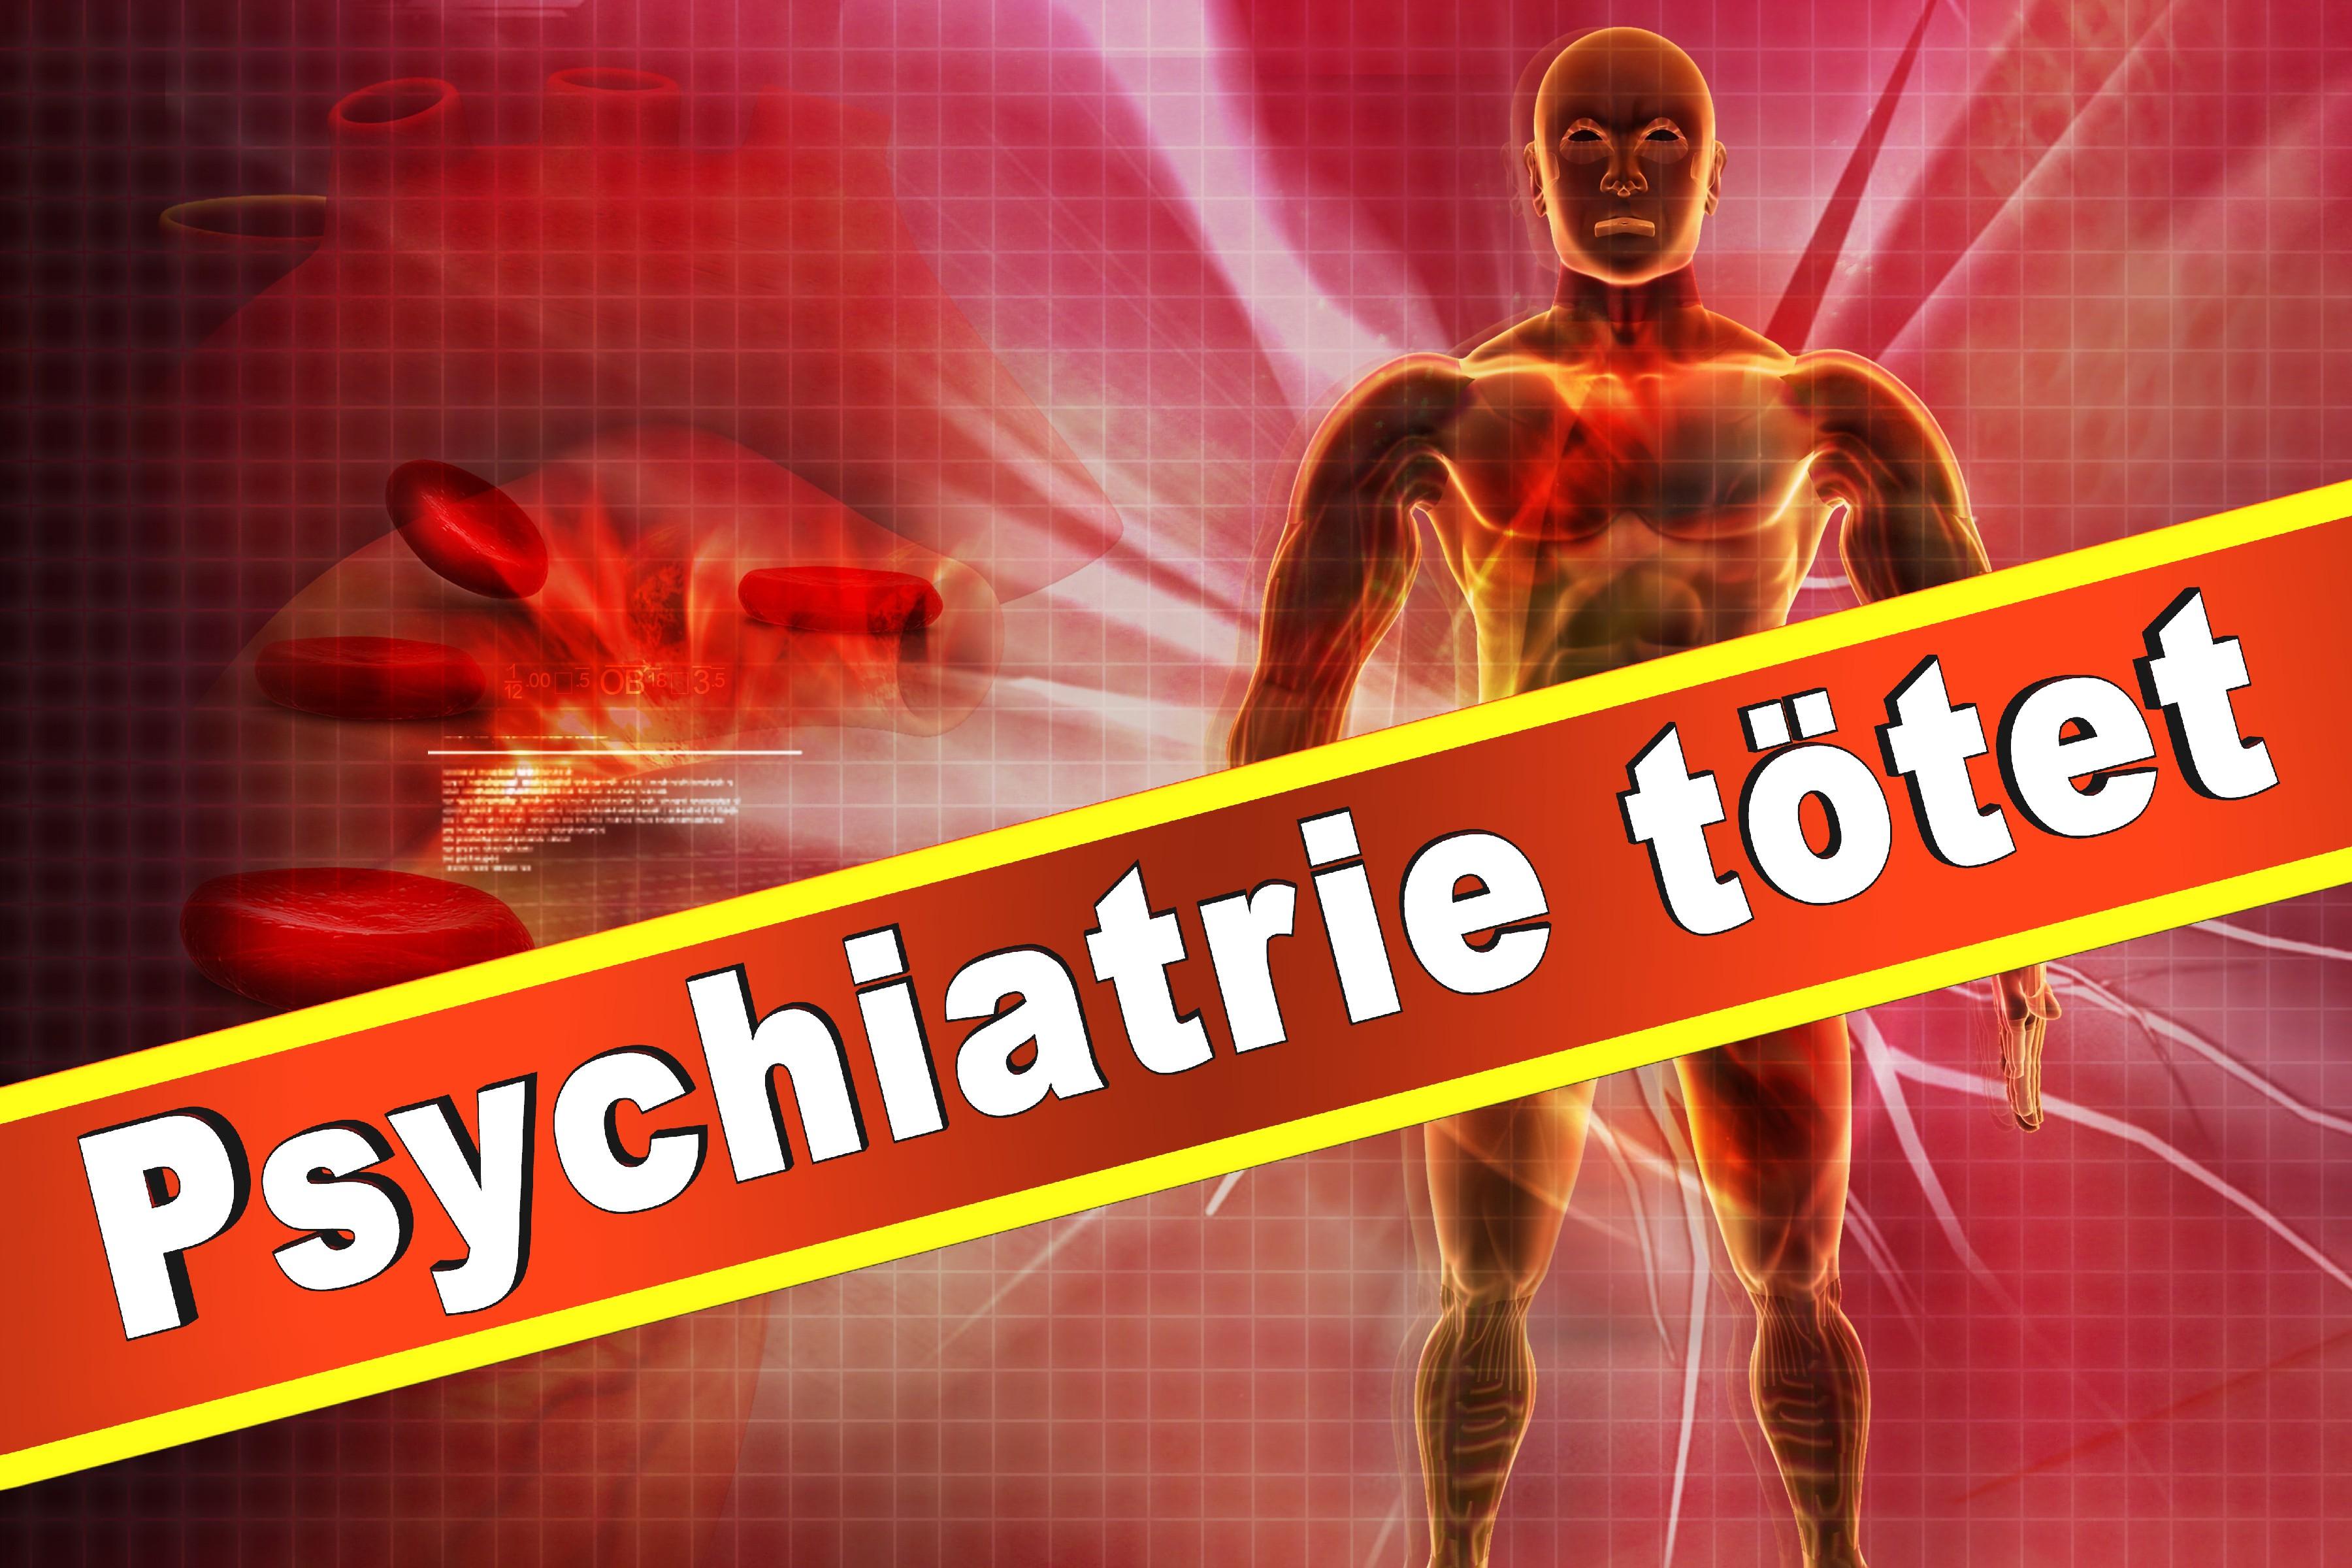 Frau Doris Rolfes Neumann Psychotherapeut Hannover Gutachten Psychiater Facharzt Psychiatrie